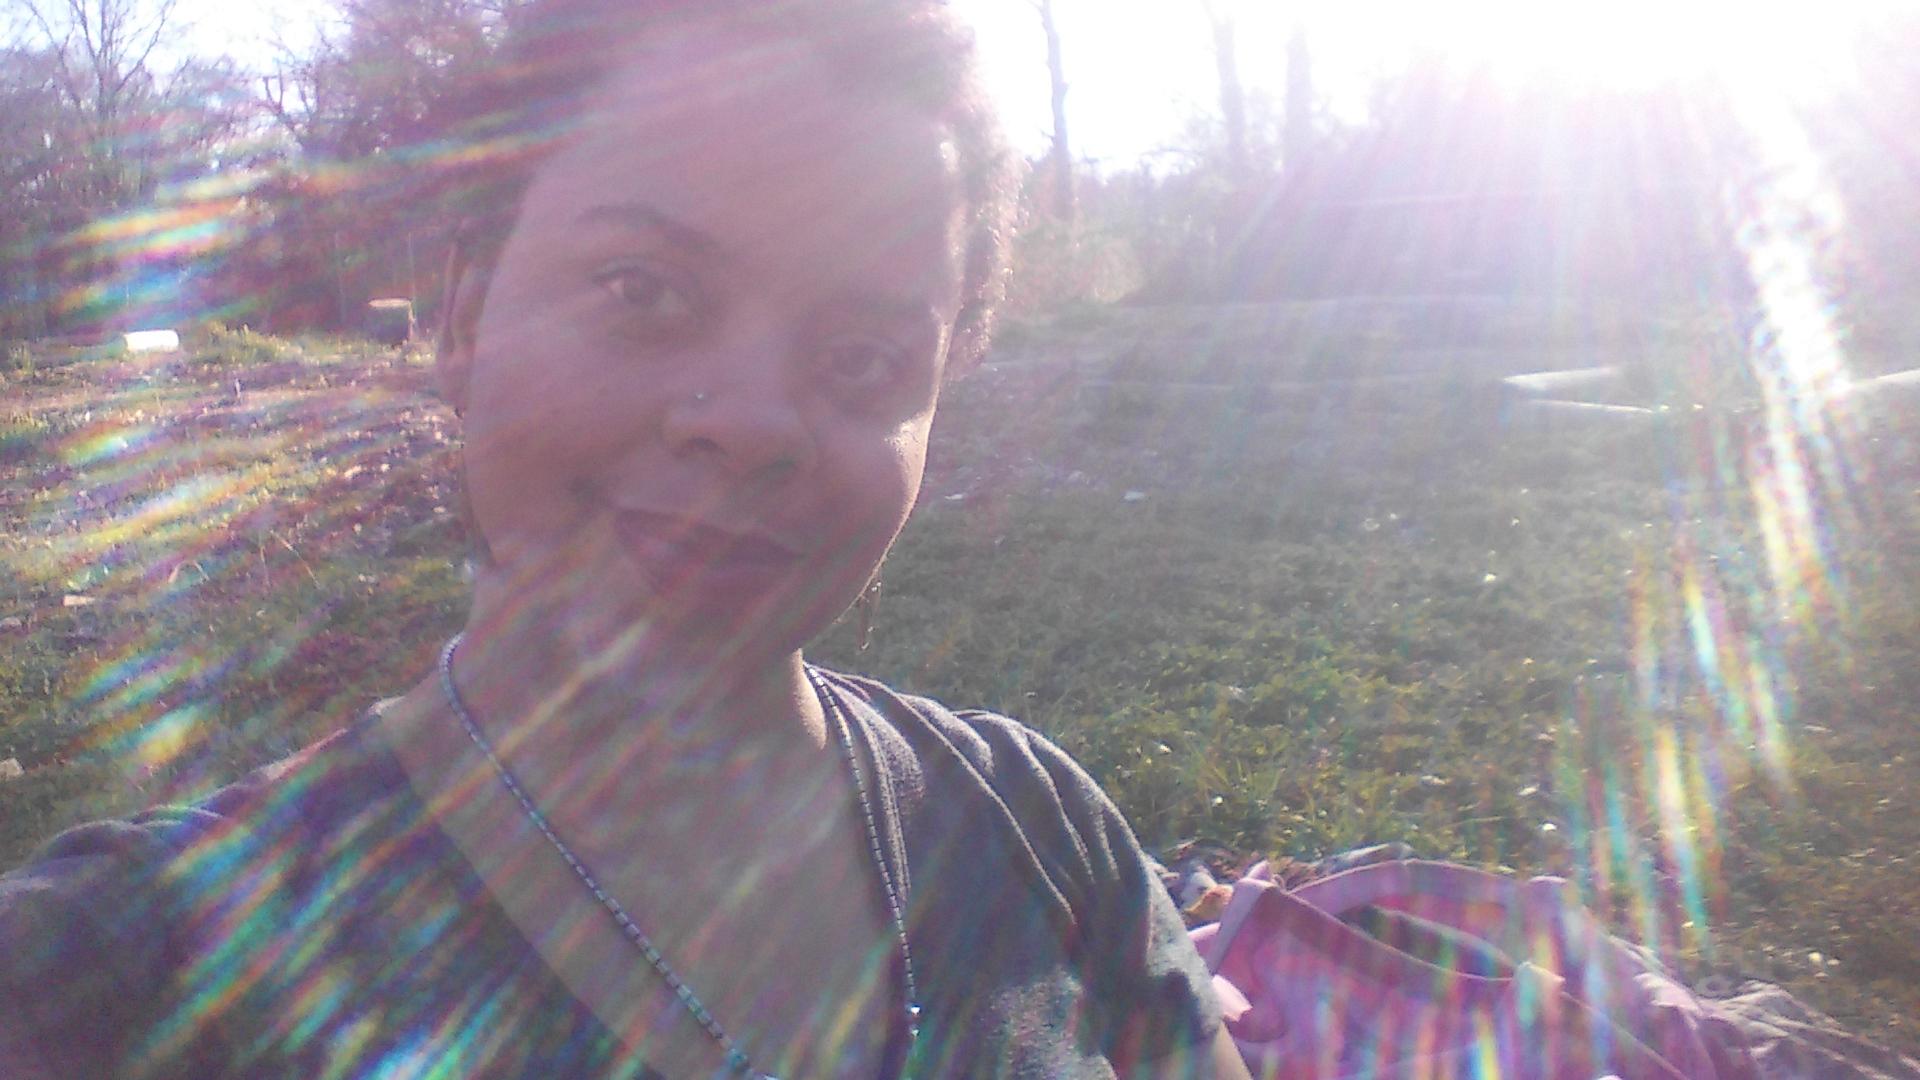 Me at the garden